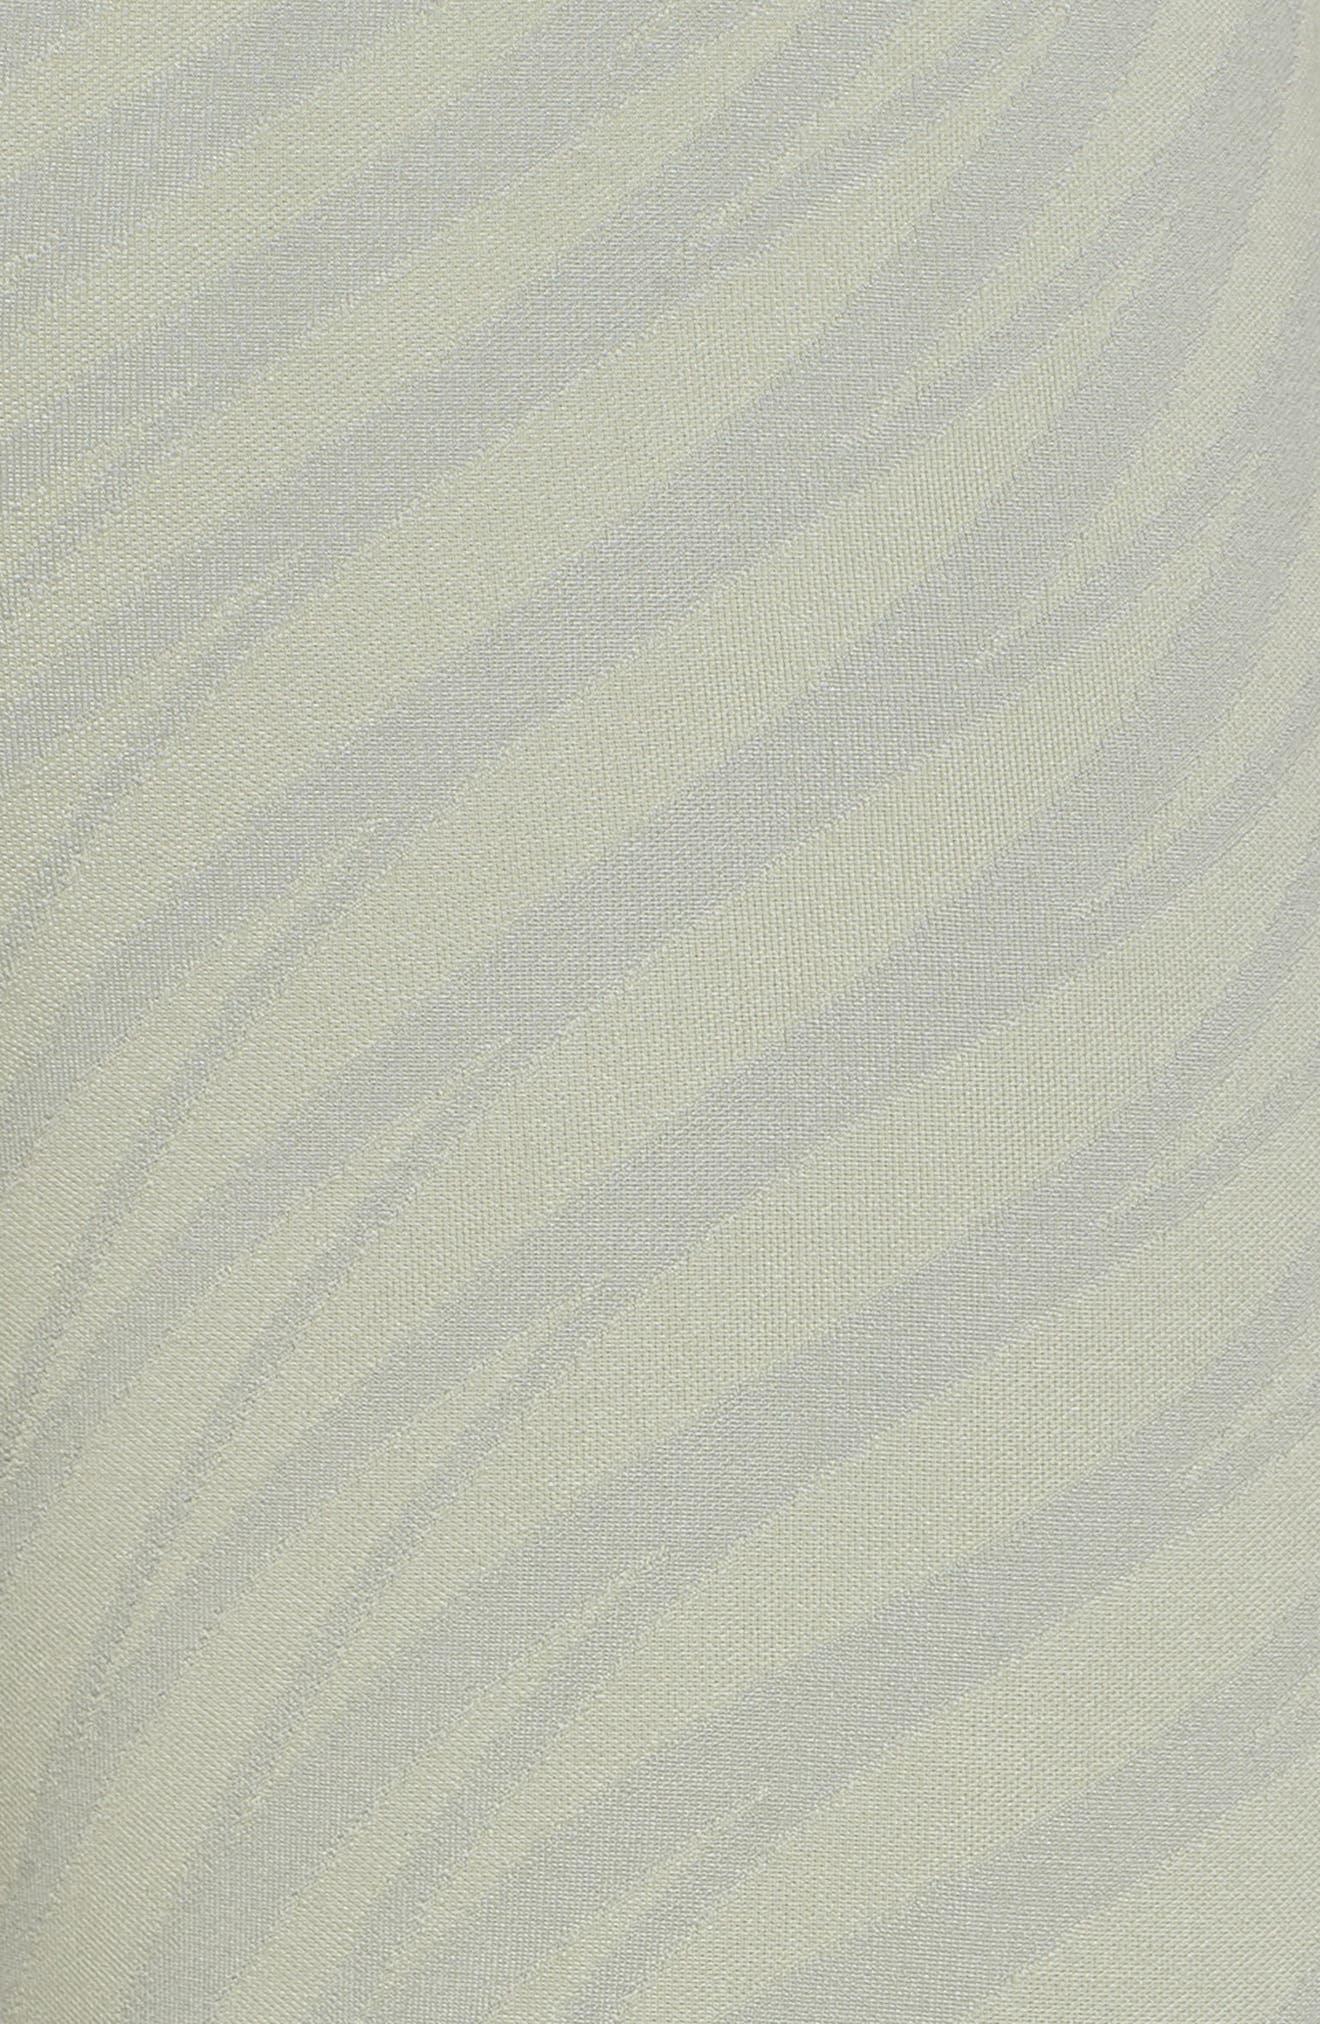 Airbrush High Waist Capris,                             Alternate thumbnail 6, color,                             Pistachio Waves